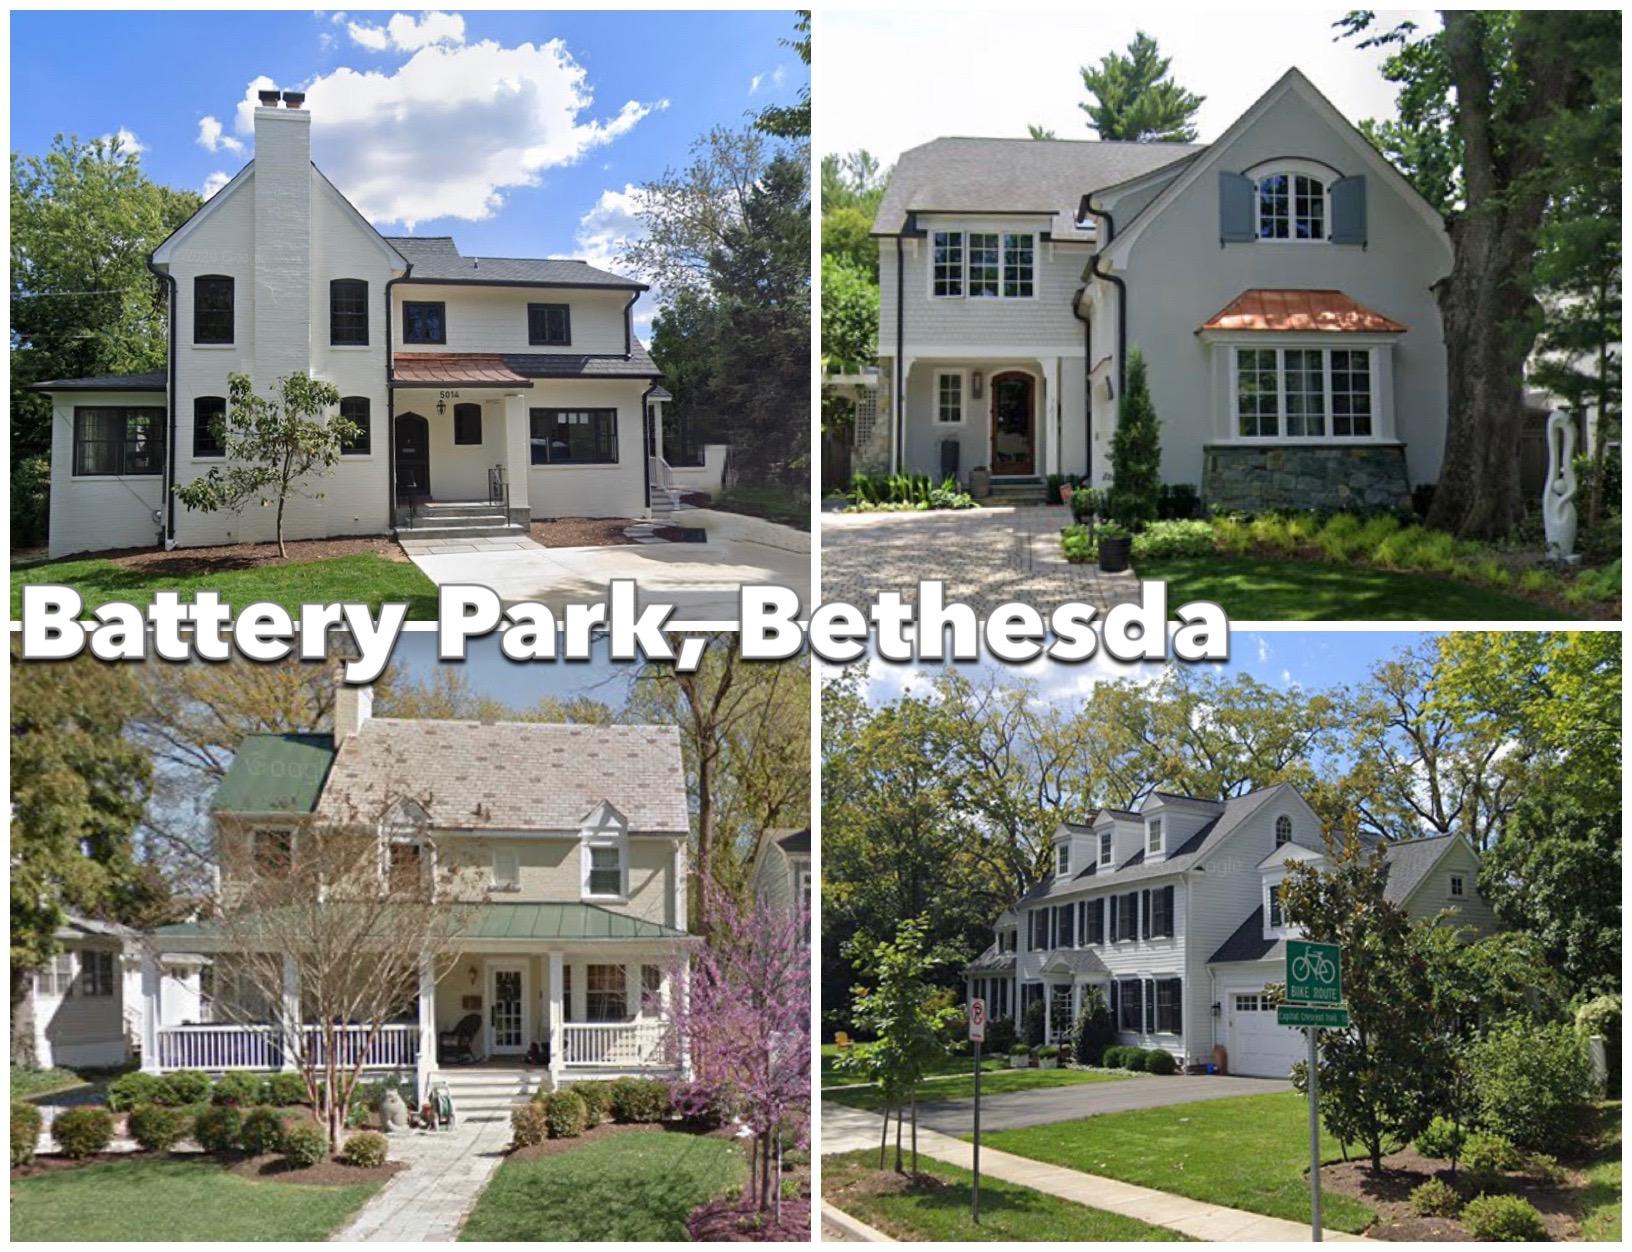 Battery Park Bethesda Home Guide - KoitzGroup